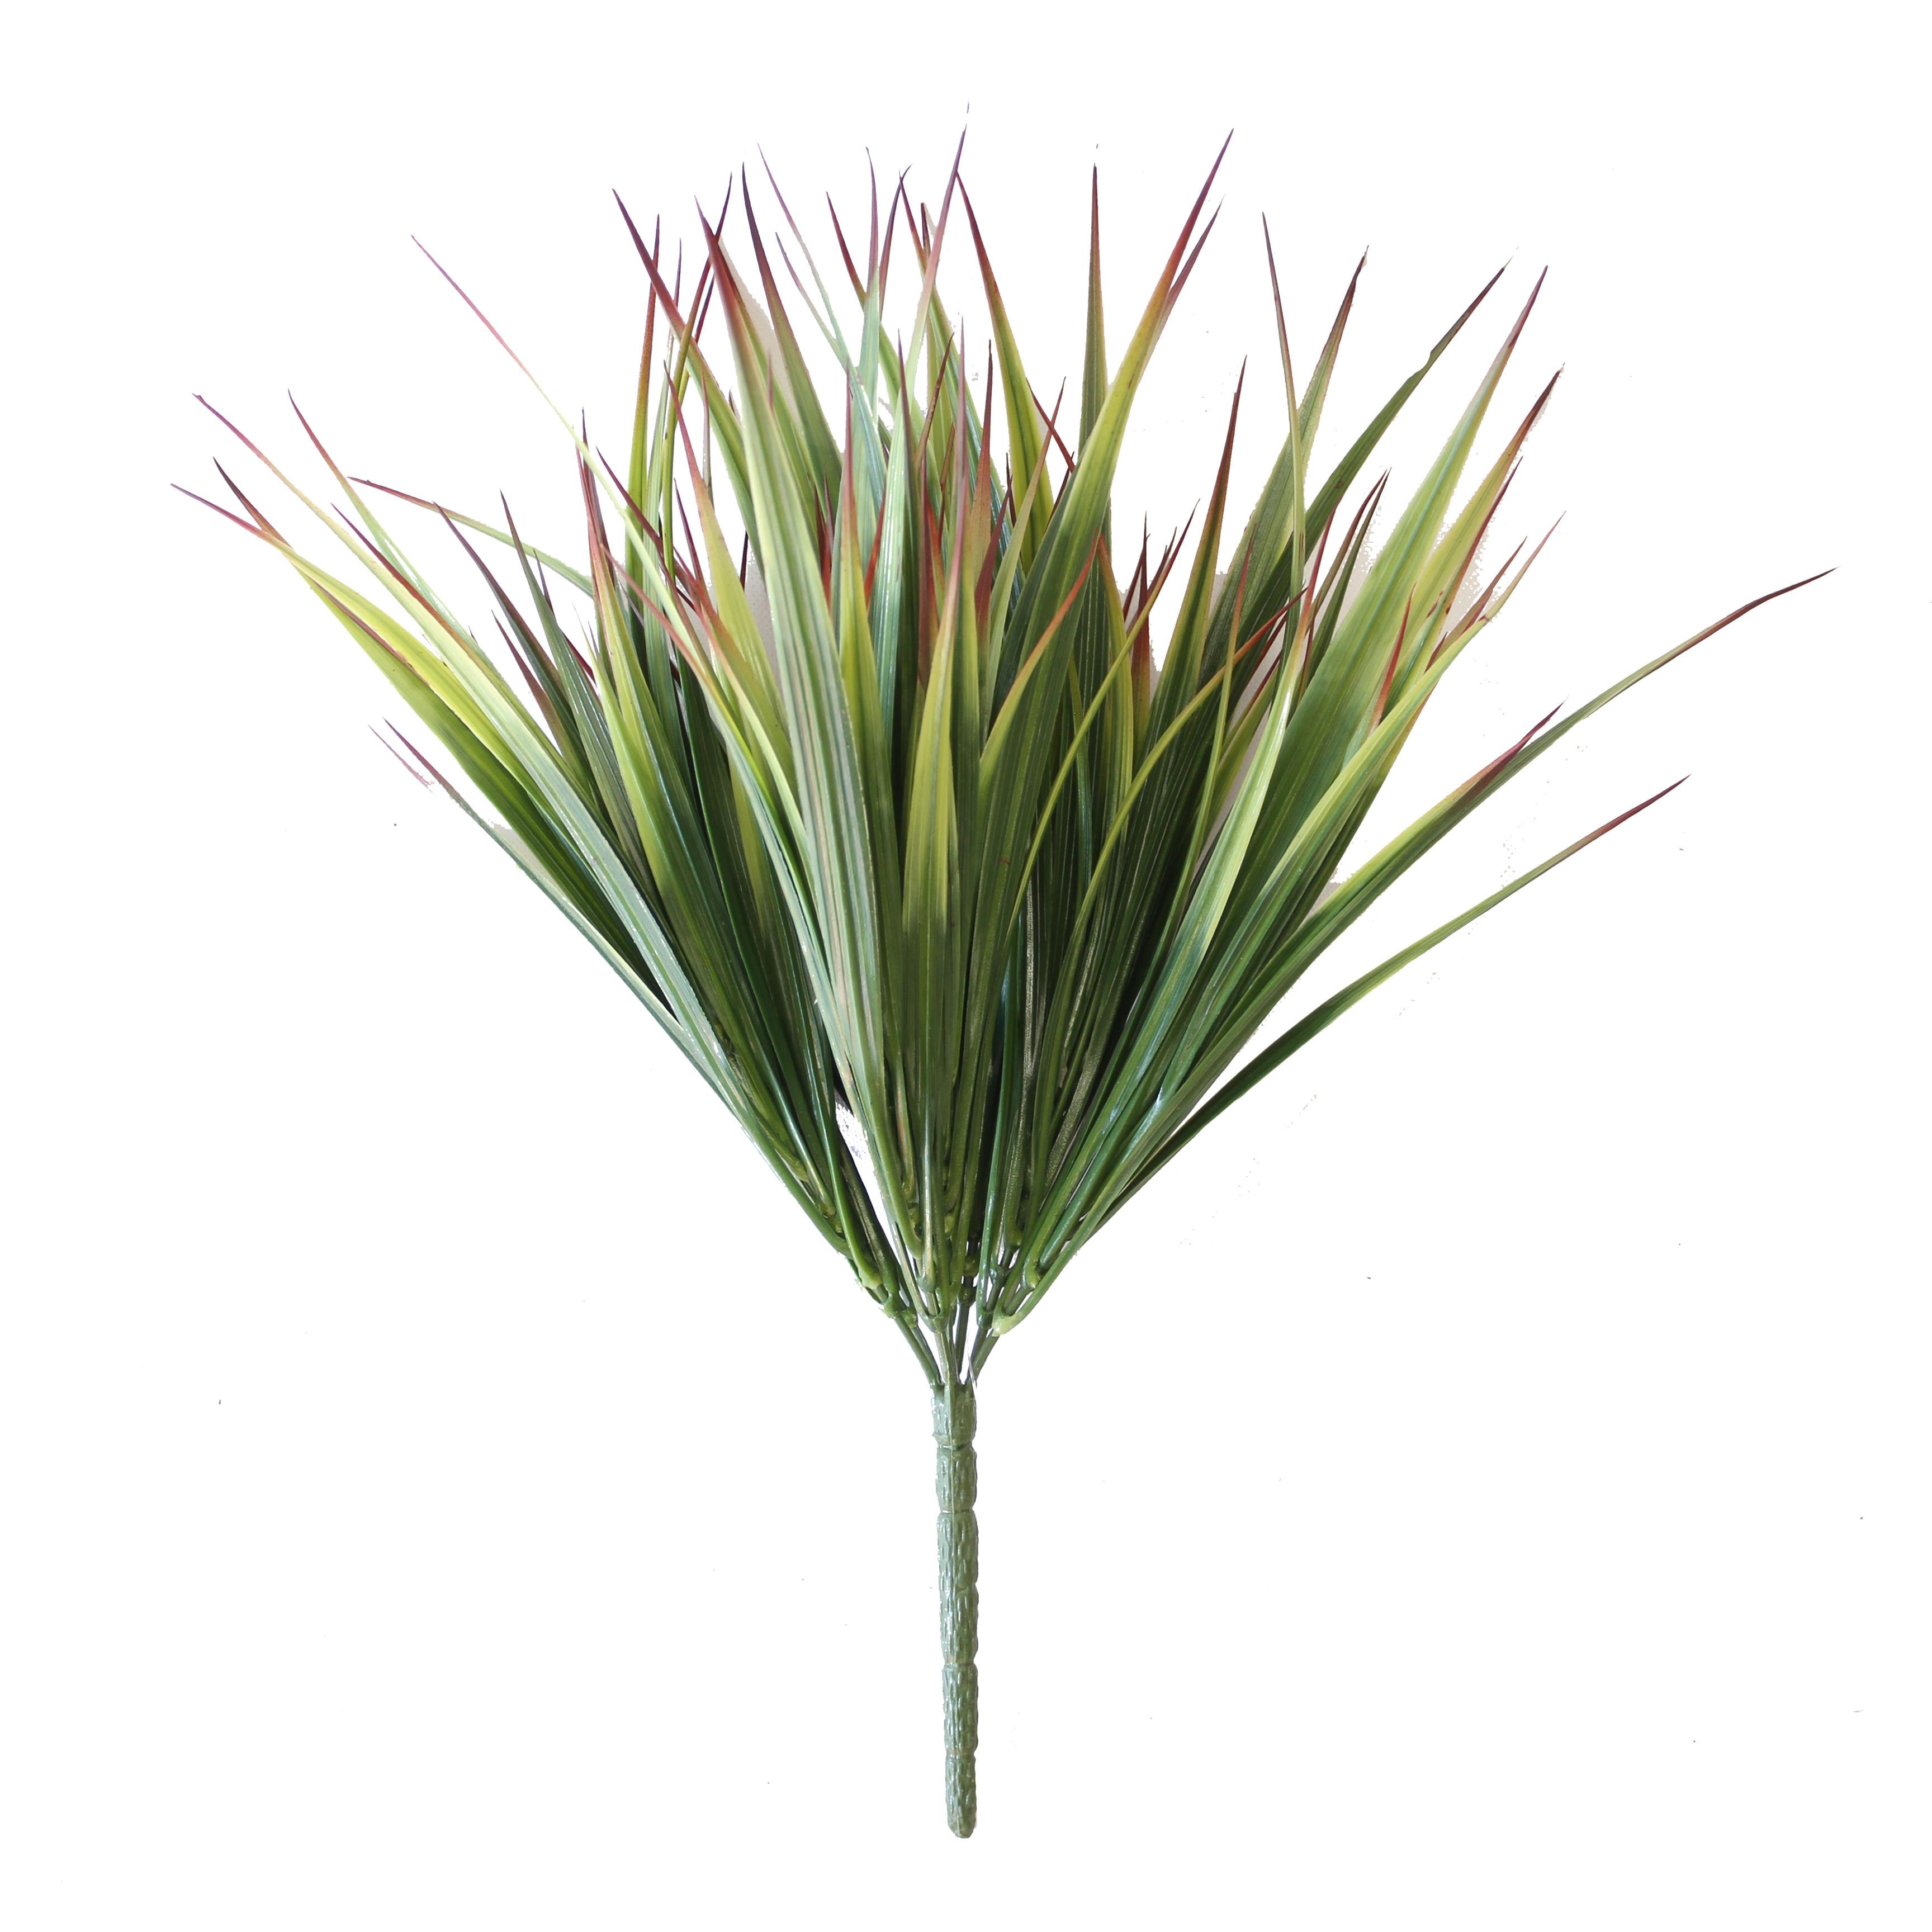 Filler - Grasses & Artificial greenery